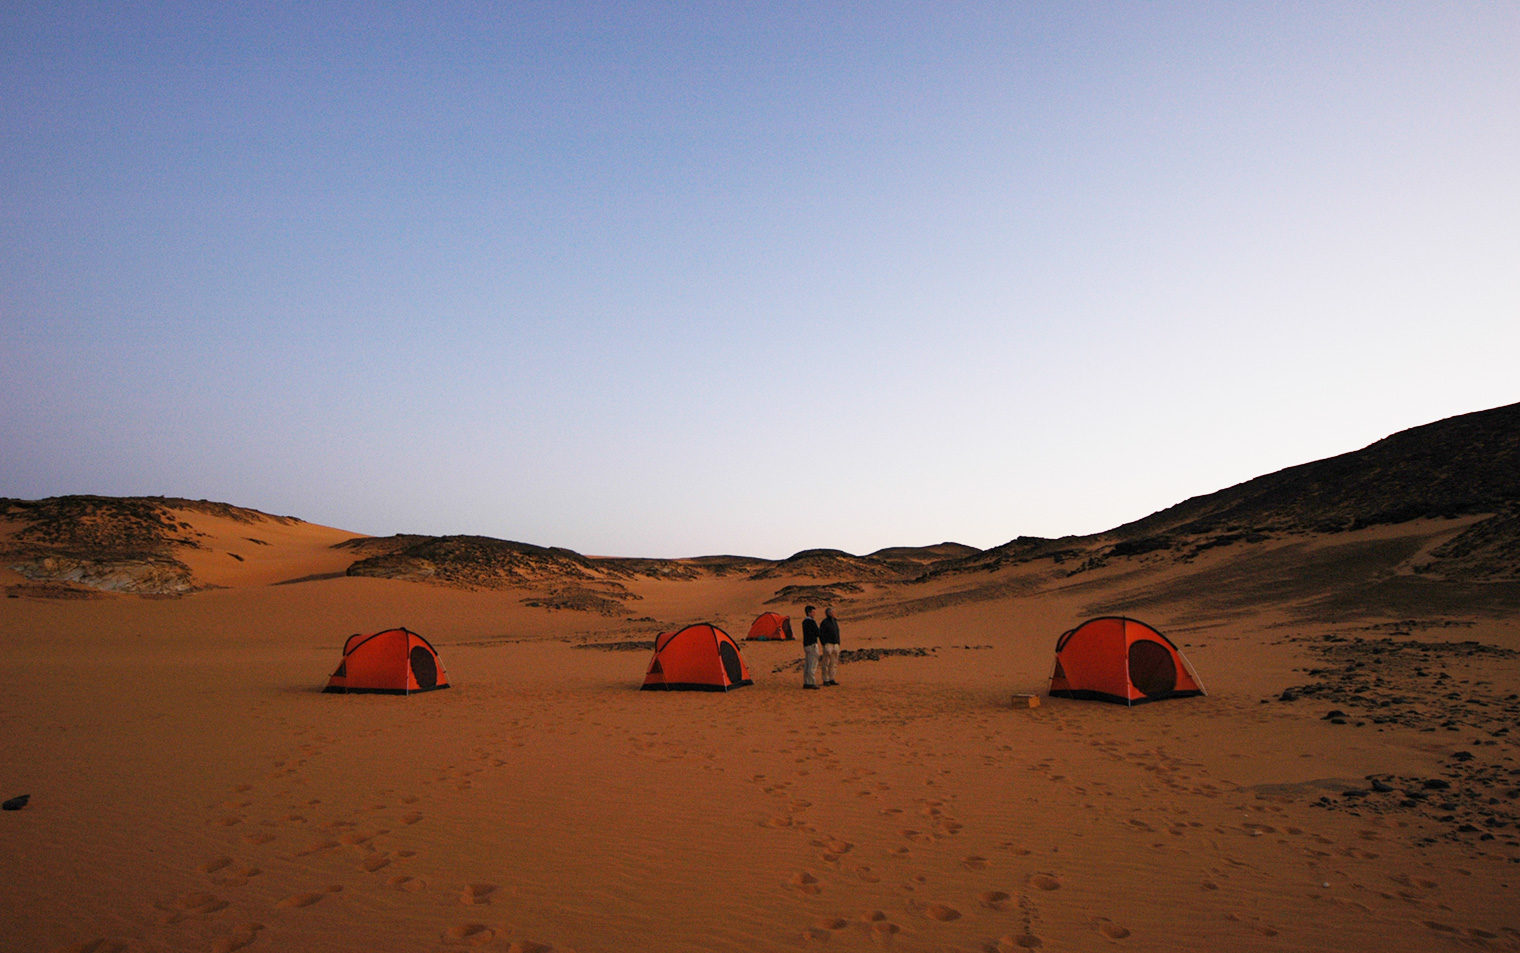 Old Dongola Sudan Tent